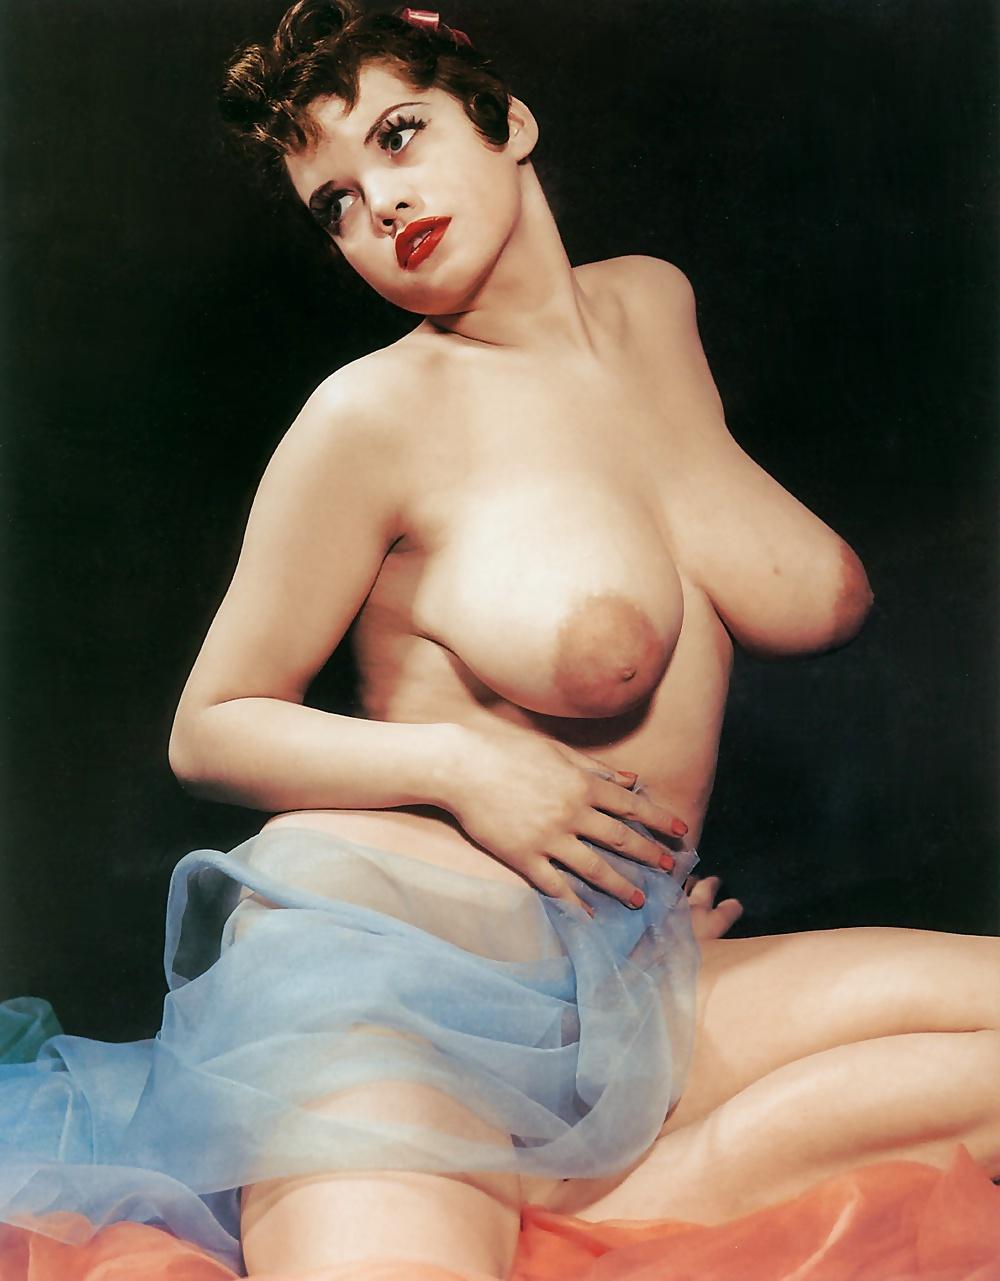 novinki-erotika-retro